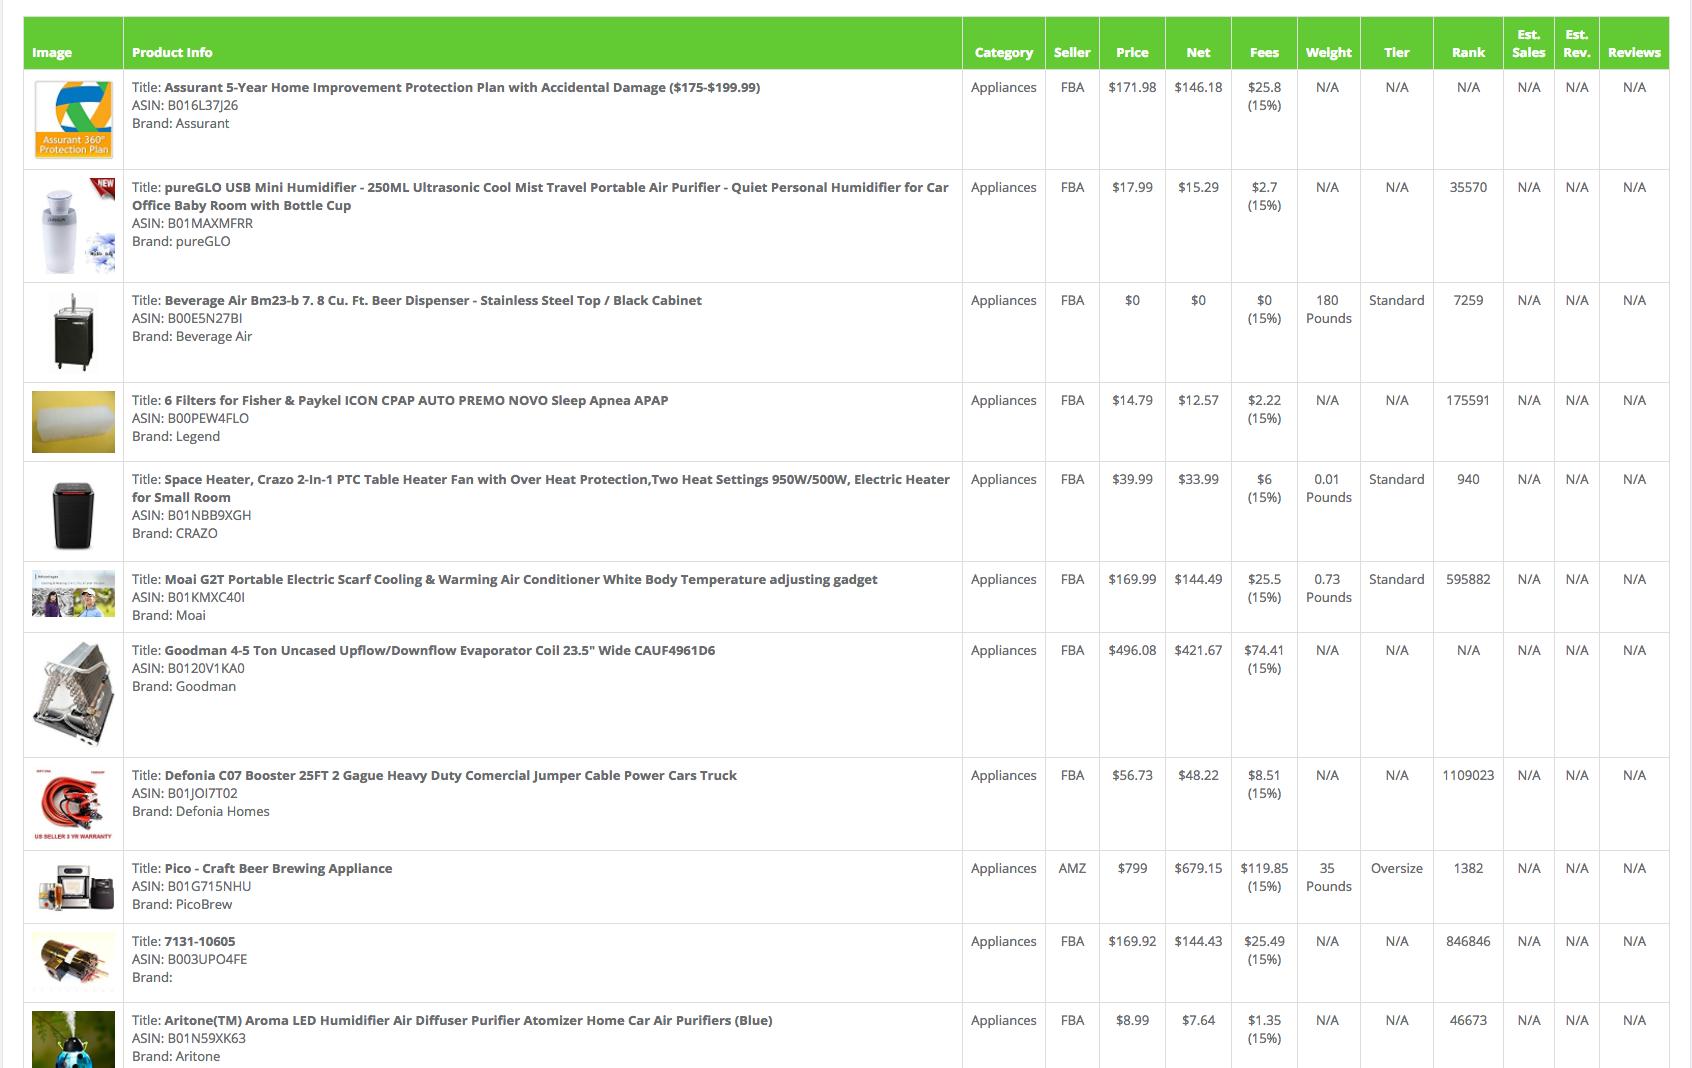 amazon-sales-improvement-service5b4c993066483f0309b9c52a